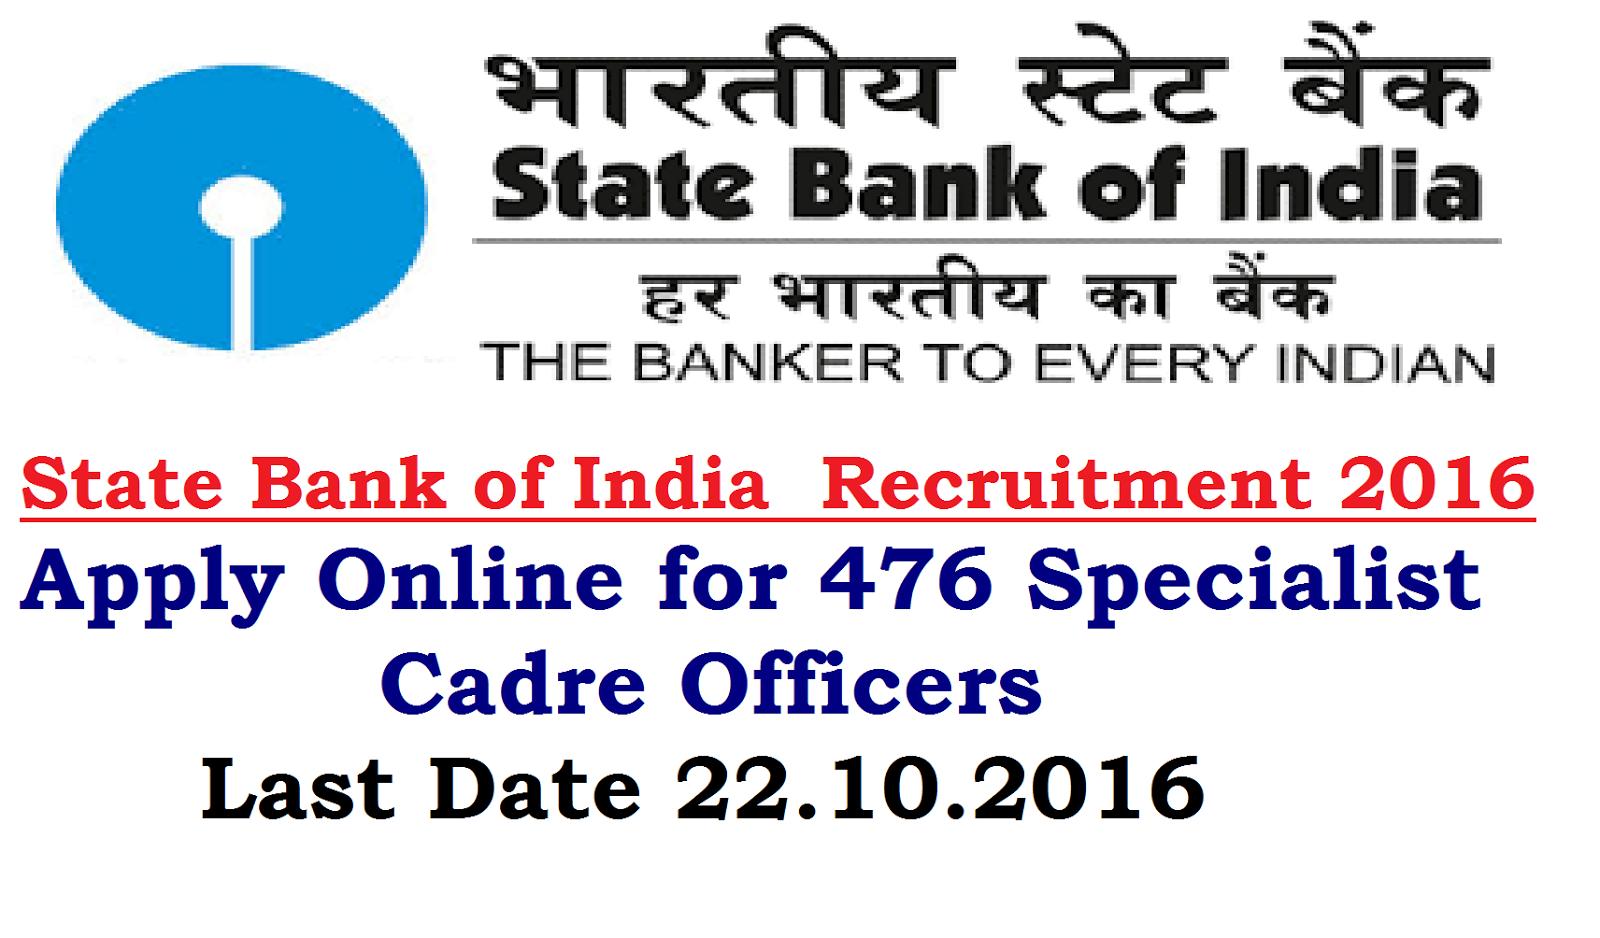 SBI State Bank of India Recruitment 2016 ~ TS Vidya Volunteers ...